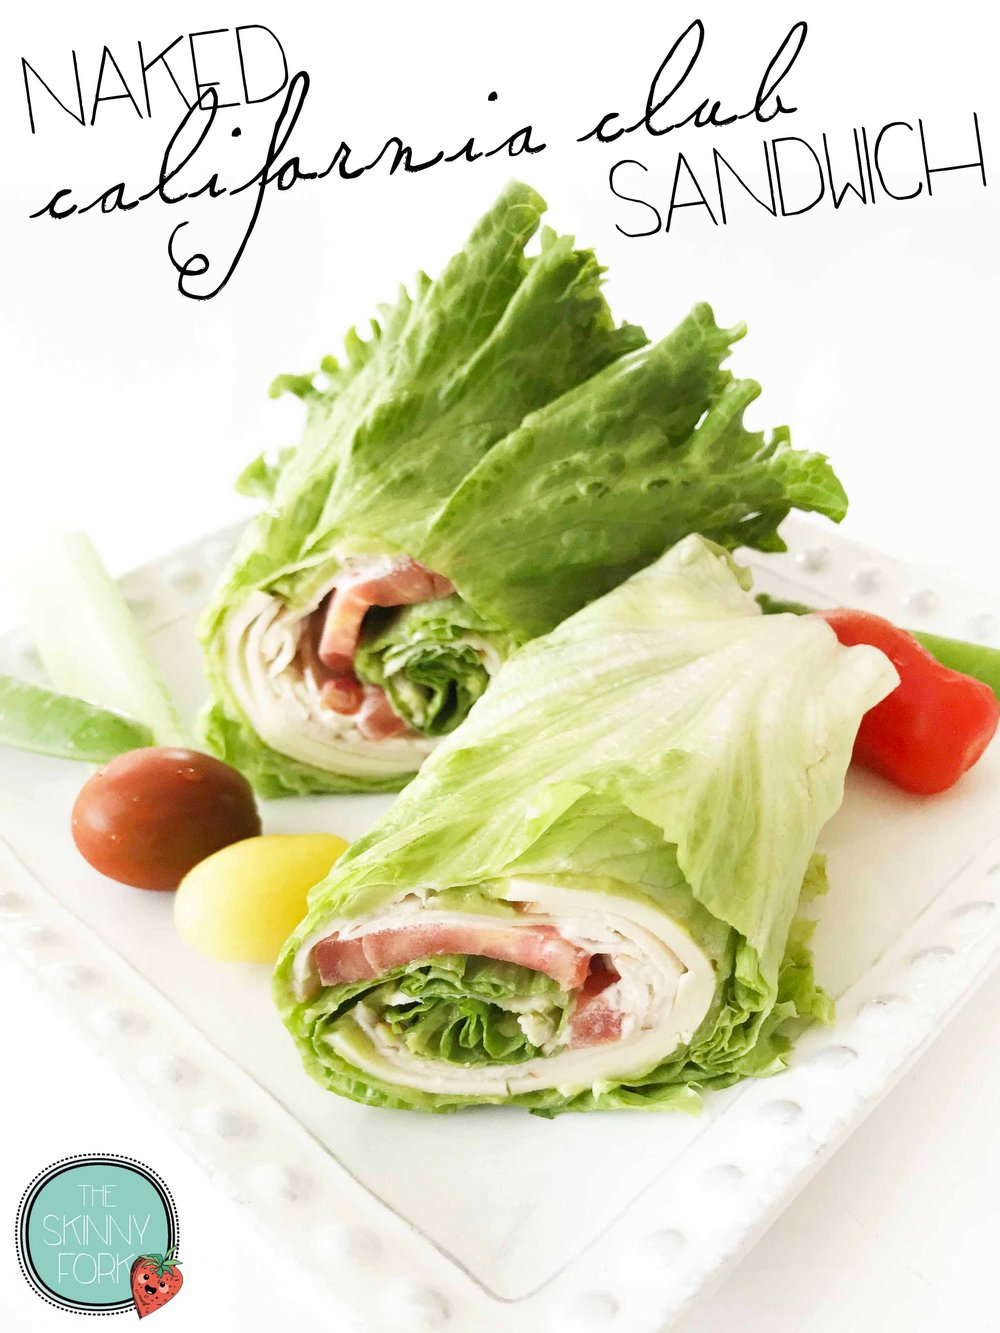 naked-club-sandwich-pin.jpg